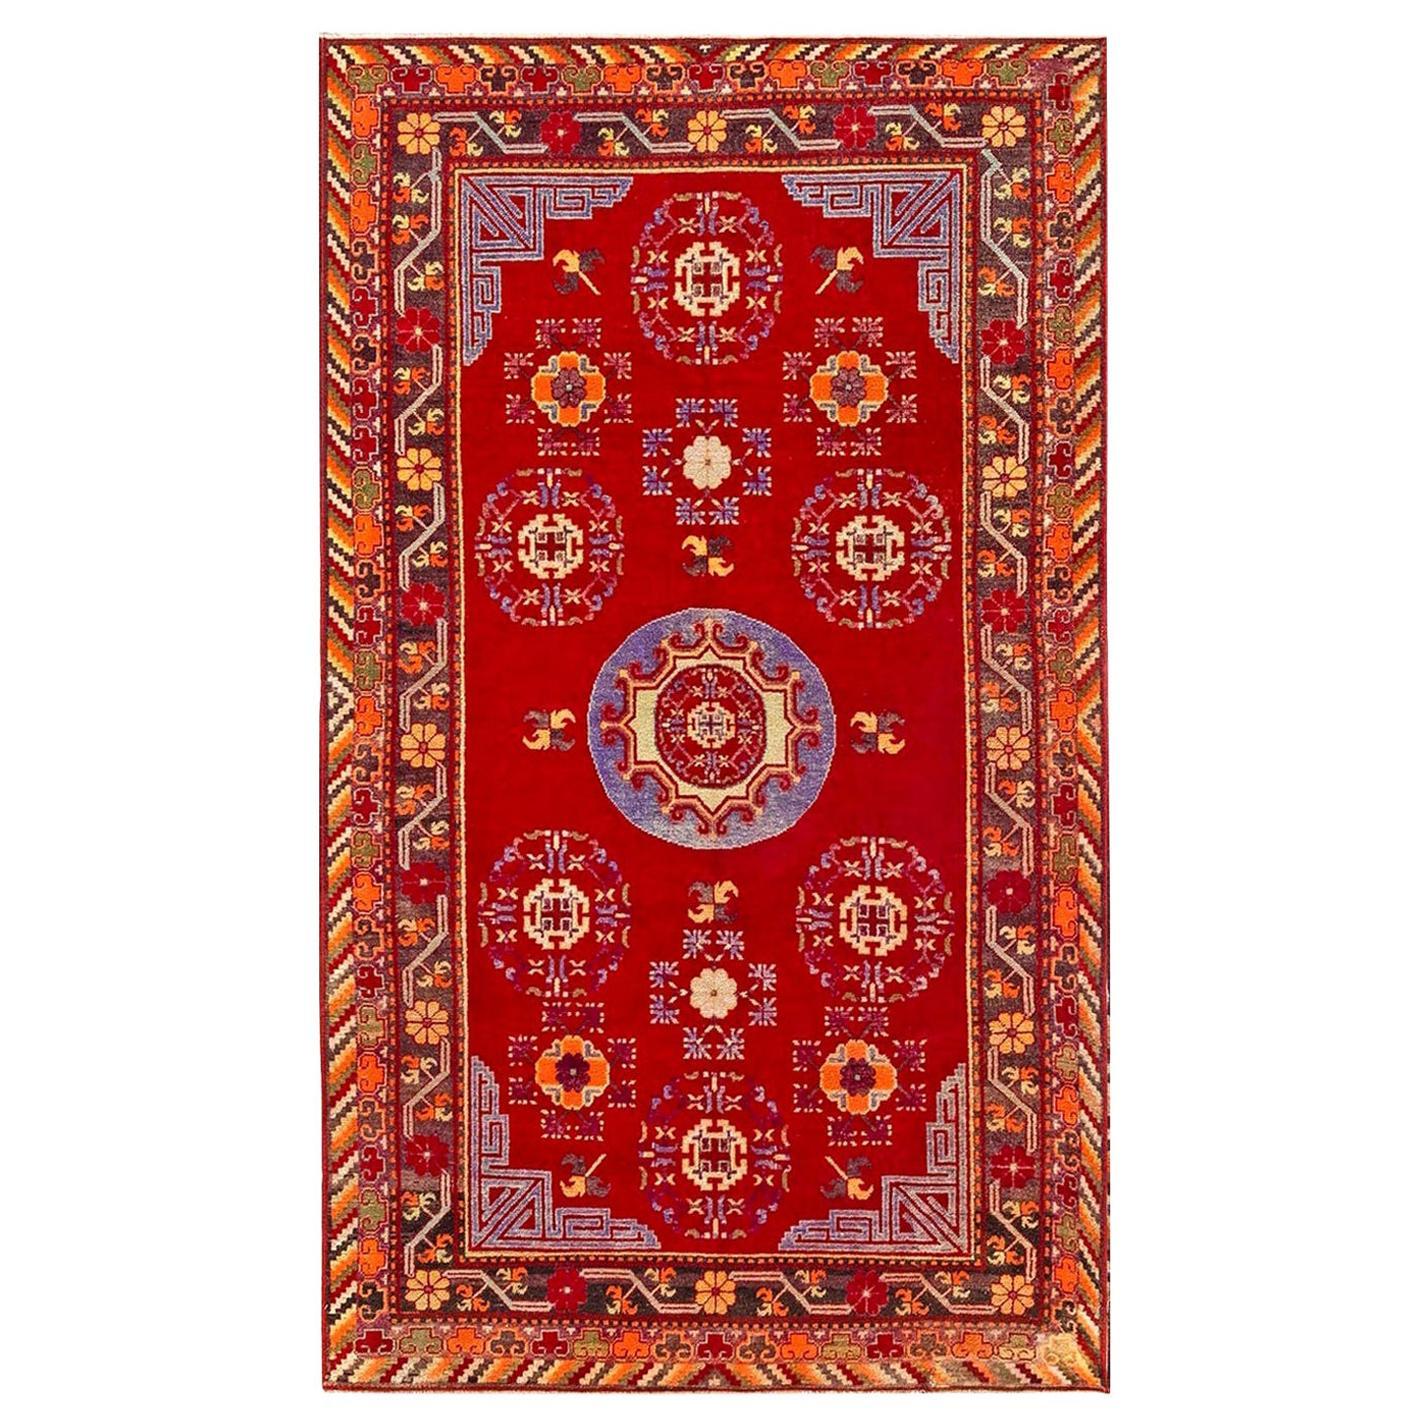 Midcentury Samarkand Red and Blue Handmade Wool Rug